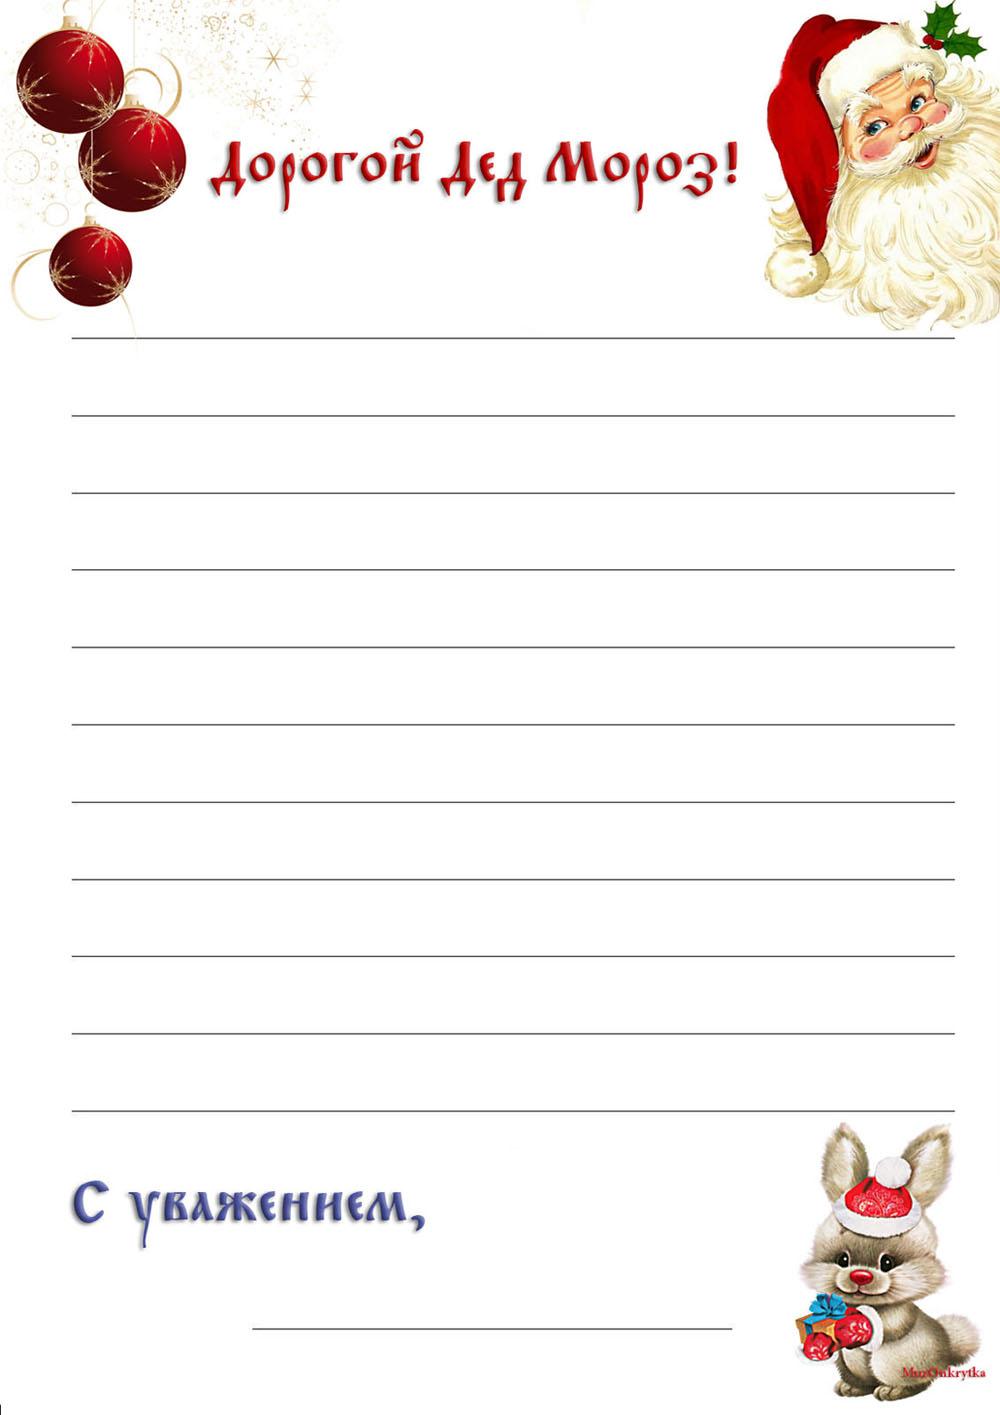 Бумага для писем дед Морозу. MuzOtkrytka.narod.ru